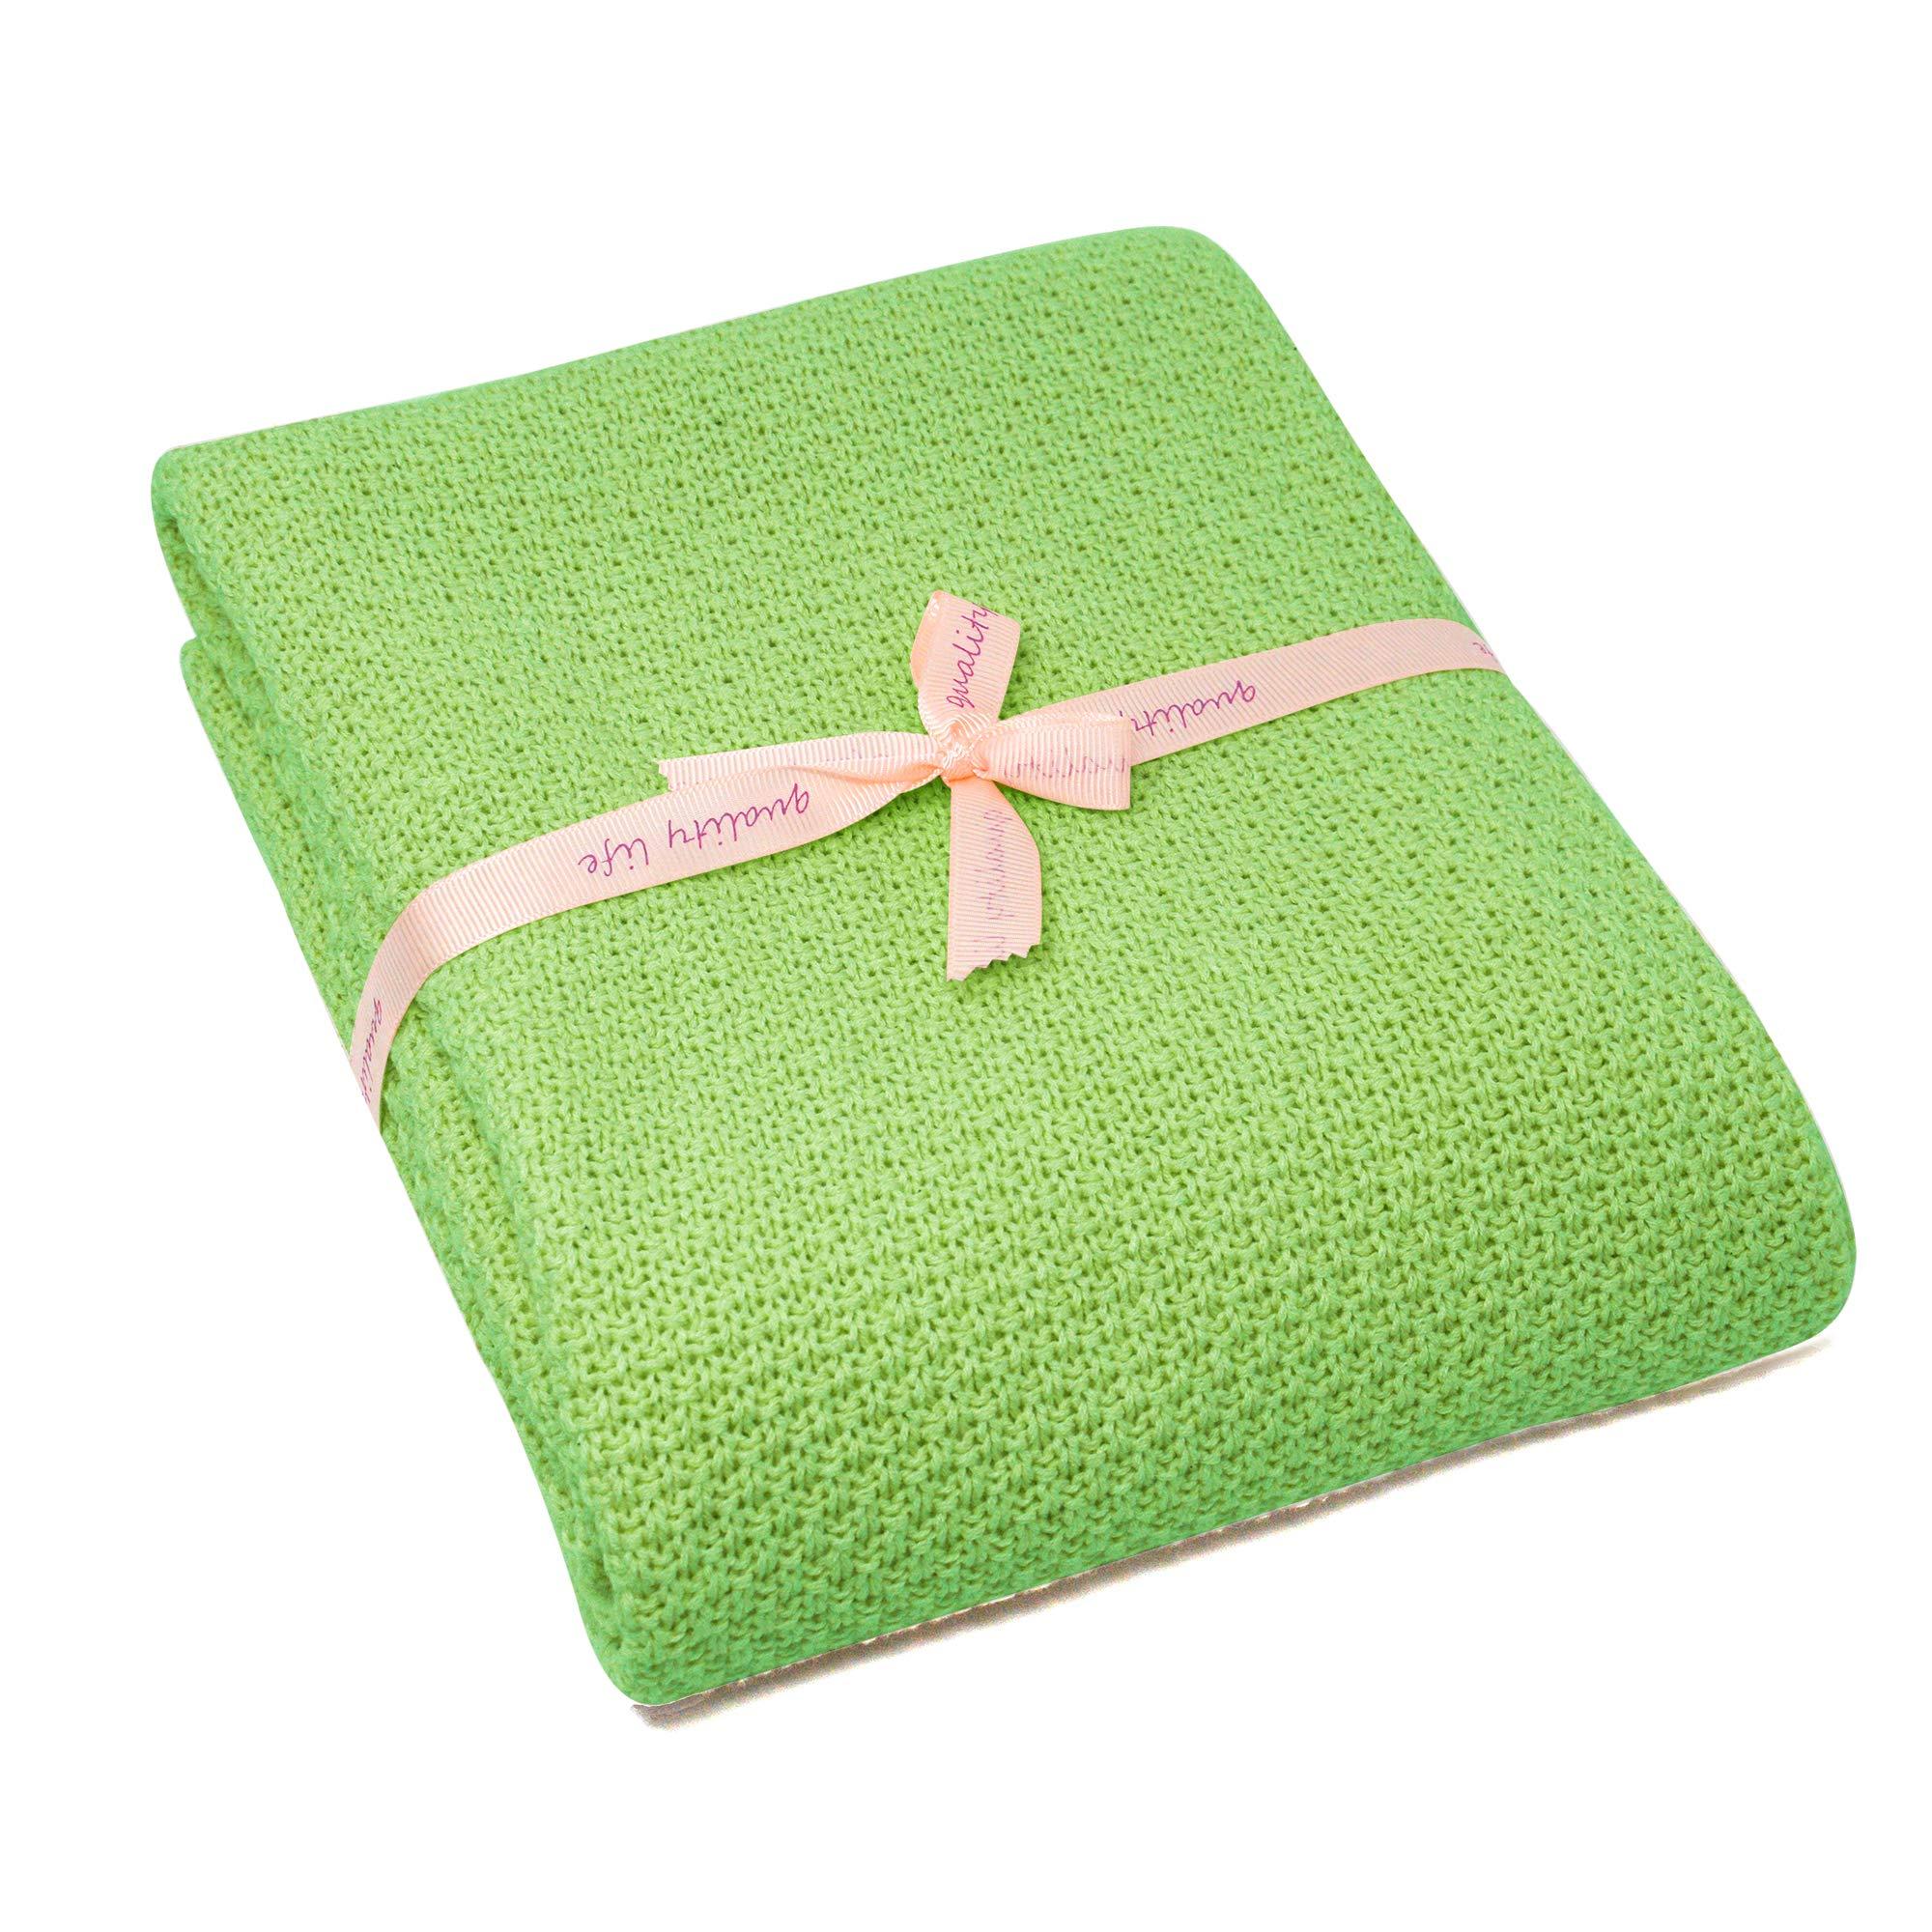 Spring Fever Baby Cozy Newborn Nursery All Season Organic Cotton Knit Bed Stroller Cover Throw Blanket Green